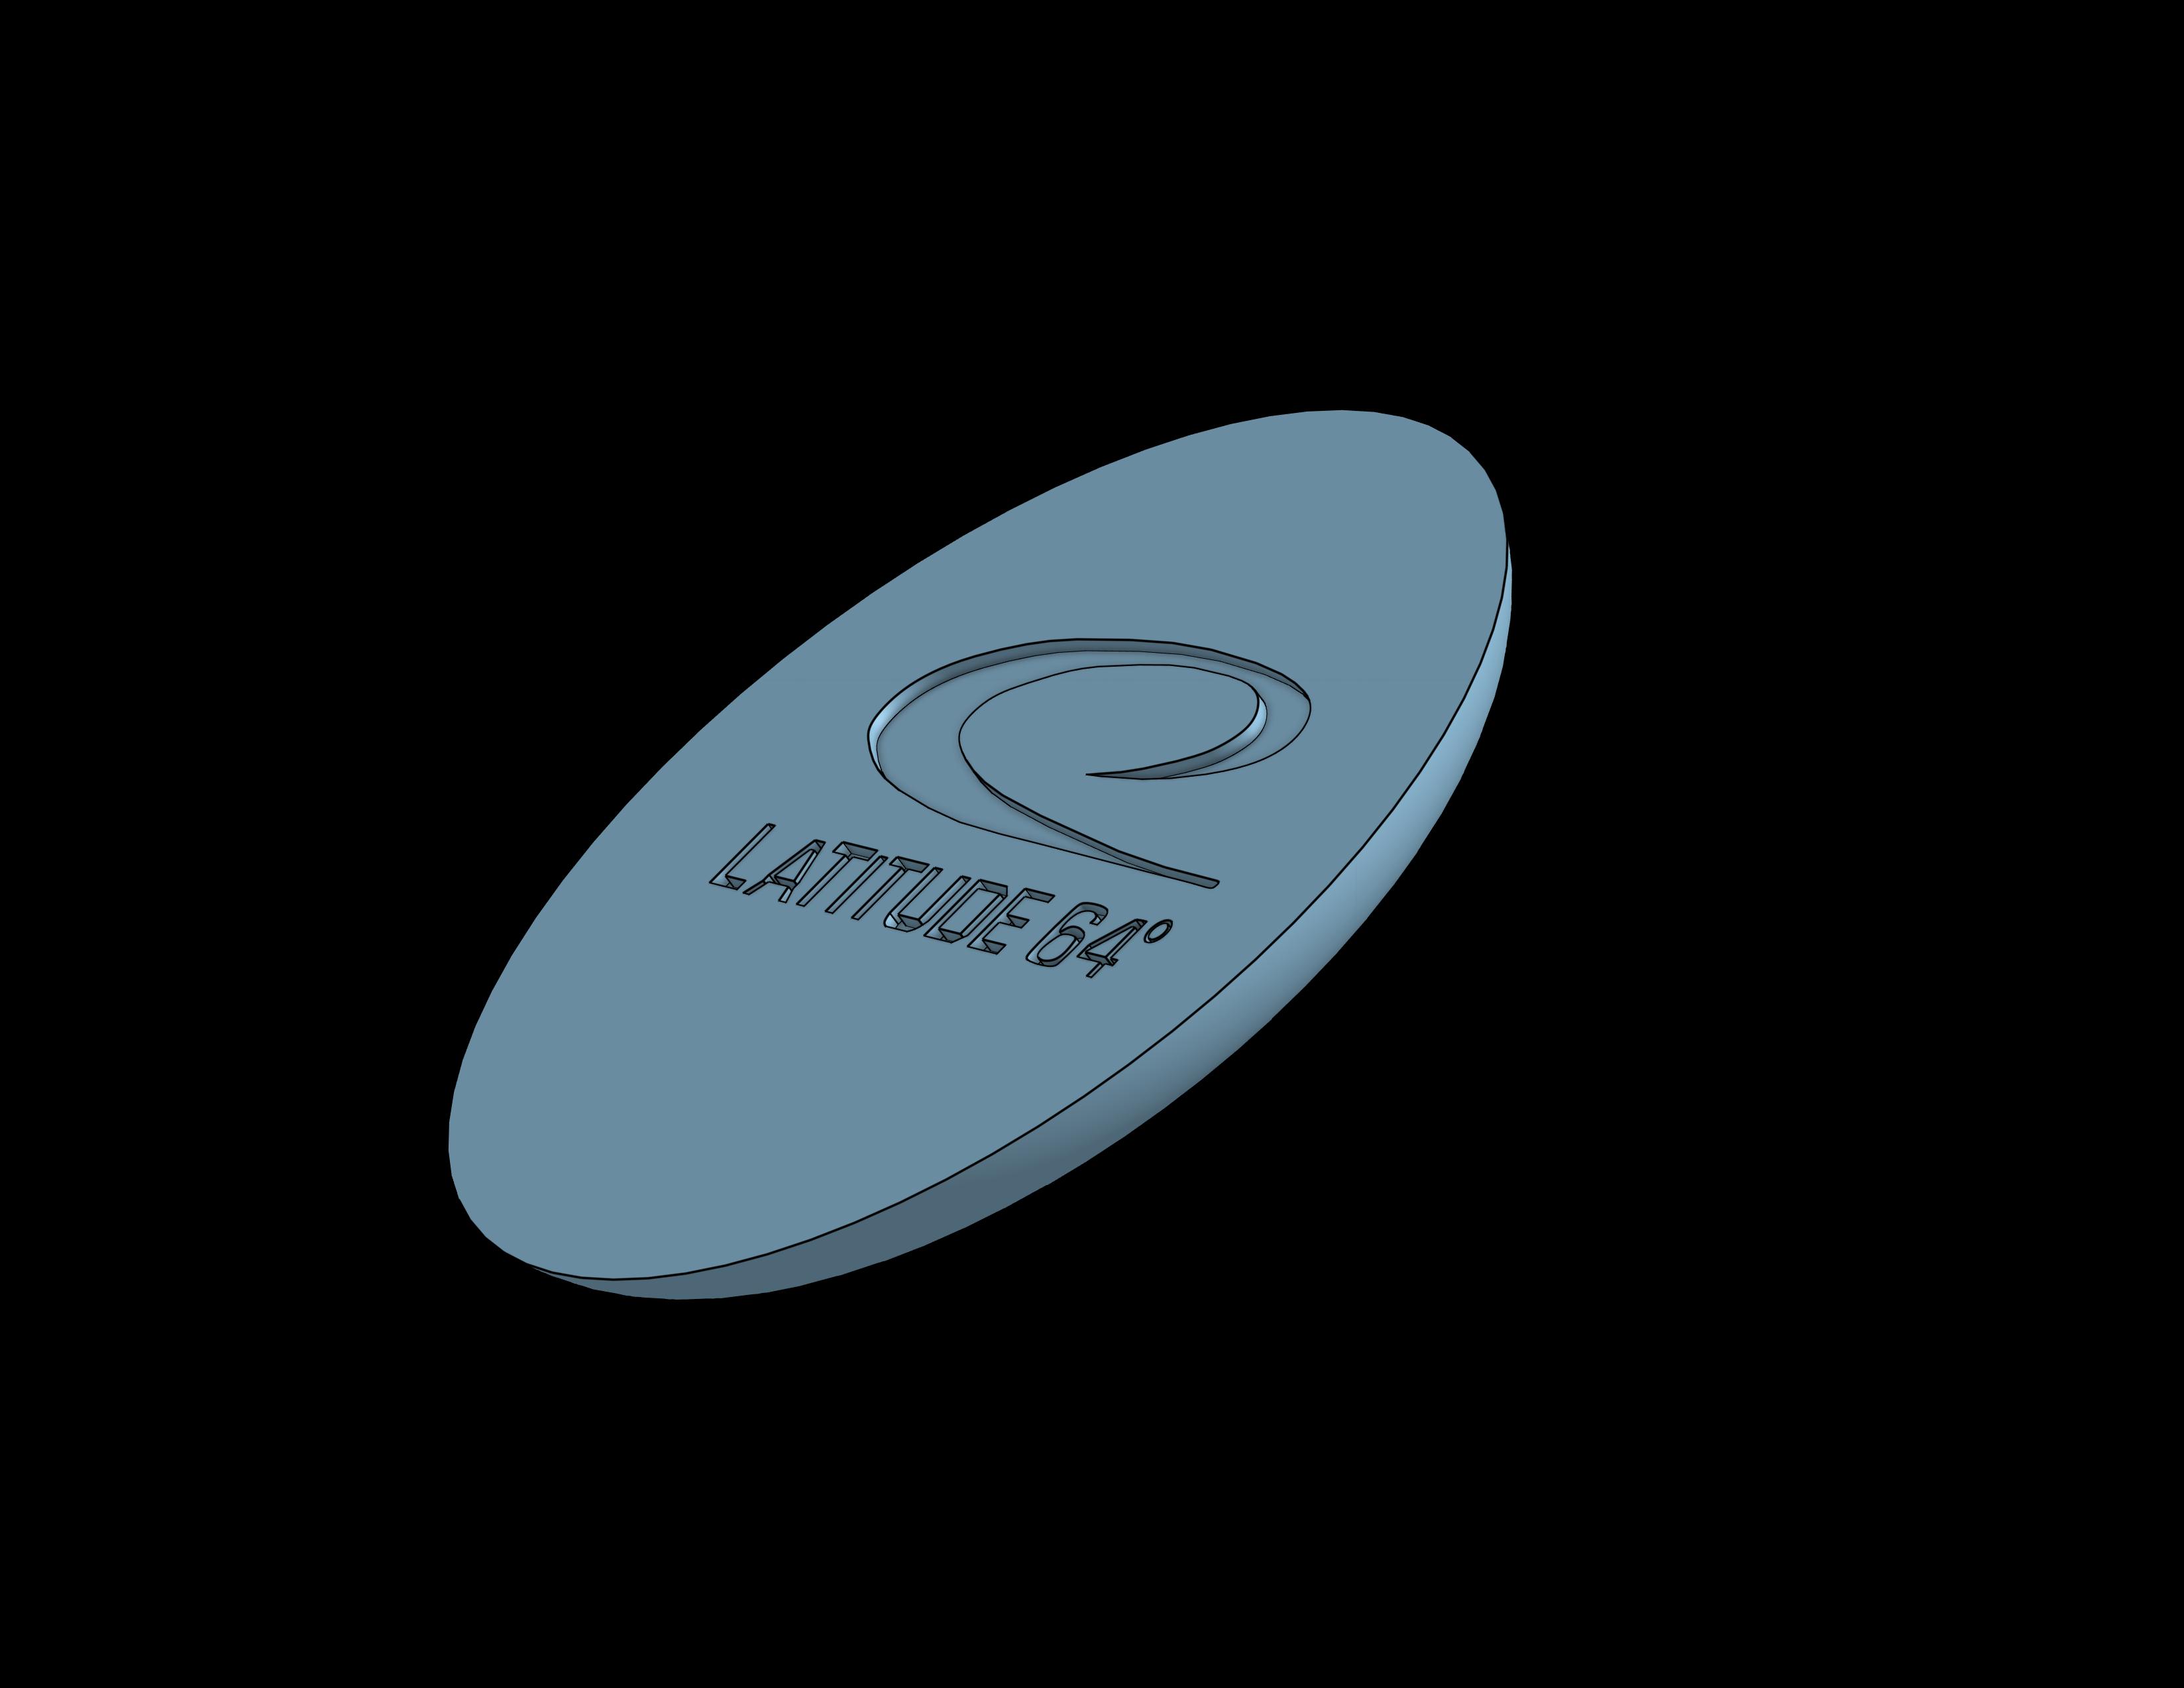 Latitude 64.png Download free STL file Disc Golf Coaster set • 3D printable design, parkerpate28